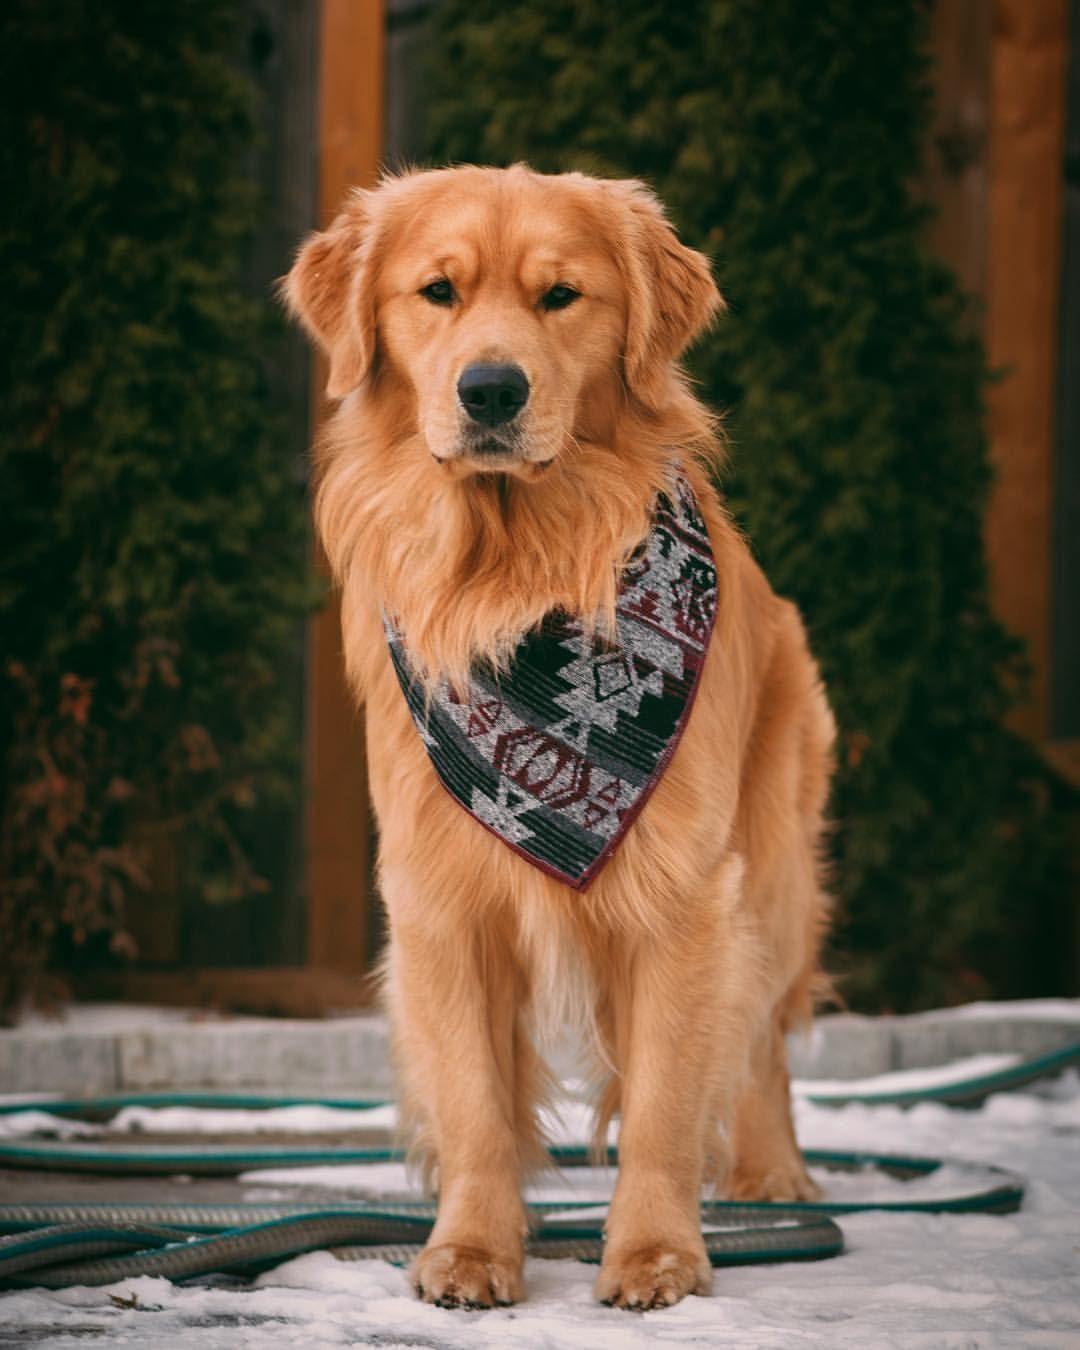 Pinterest Carolinecourier Golden Retriever Golden Retriever Puppy Photography Dogs Golden Retriever